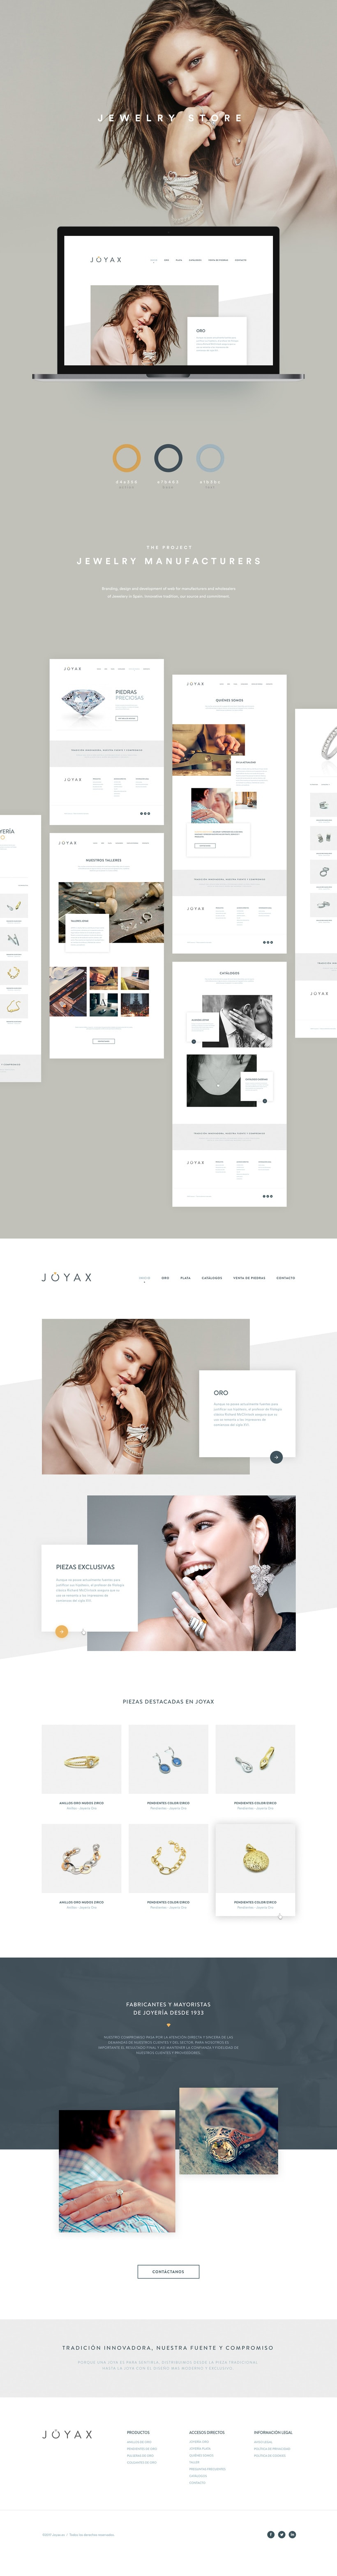 Jewelry Store 0